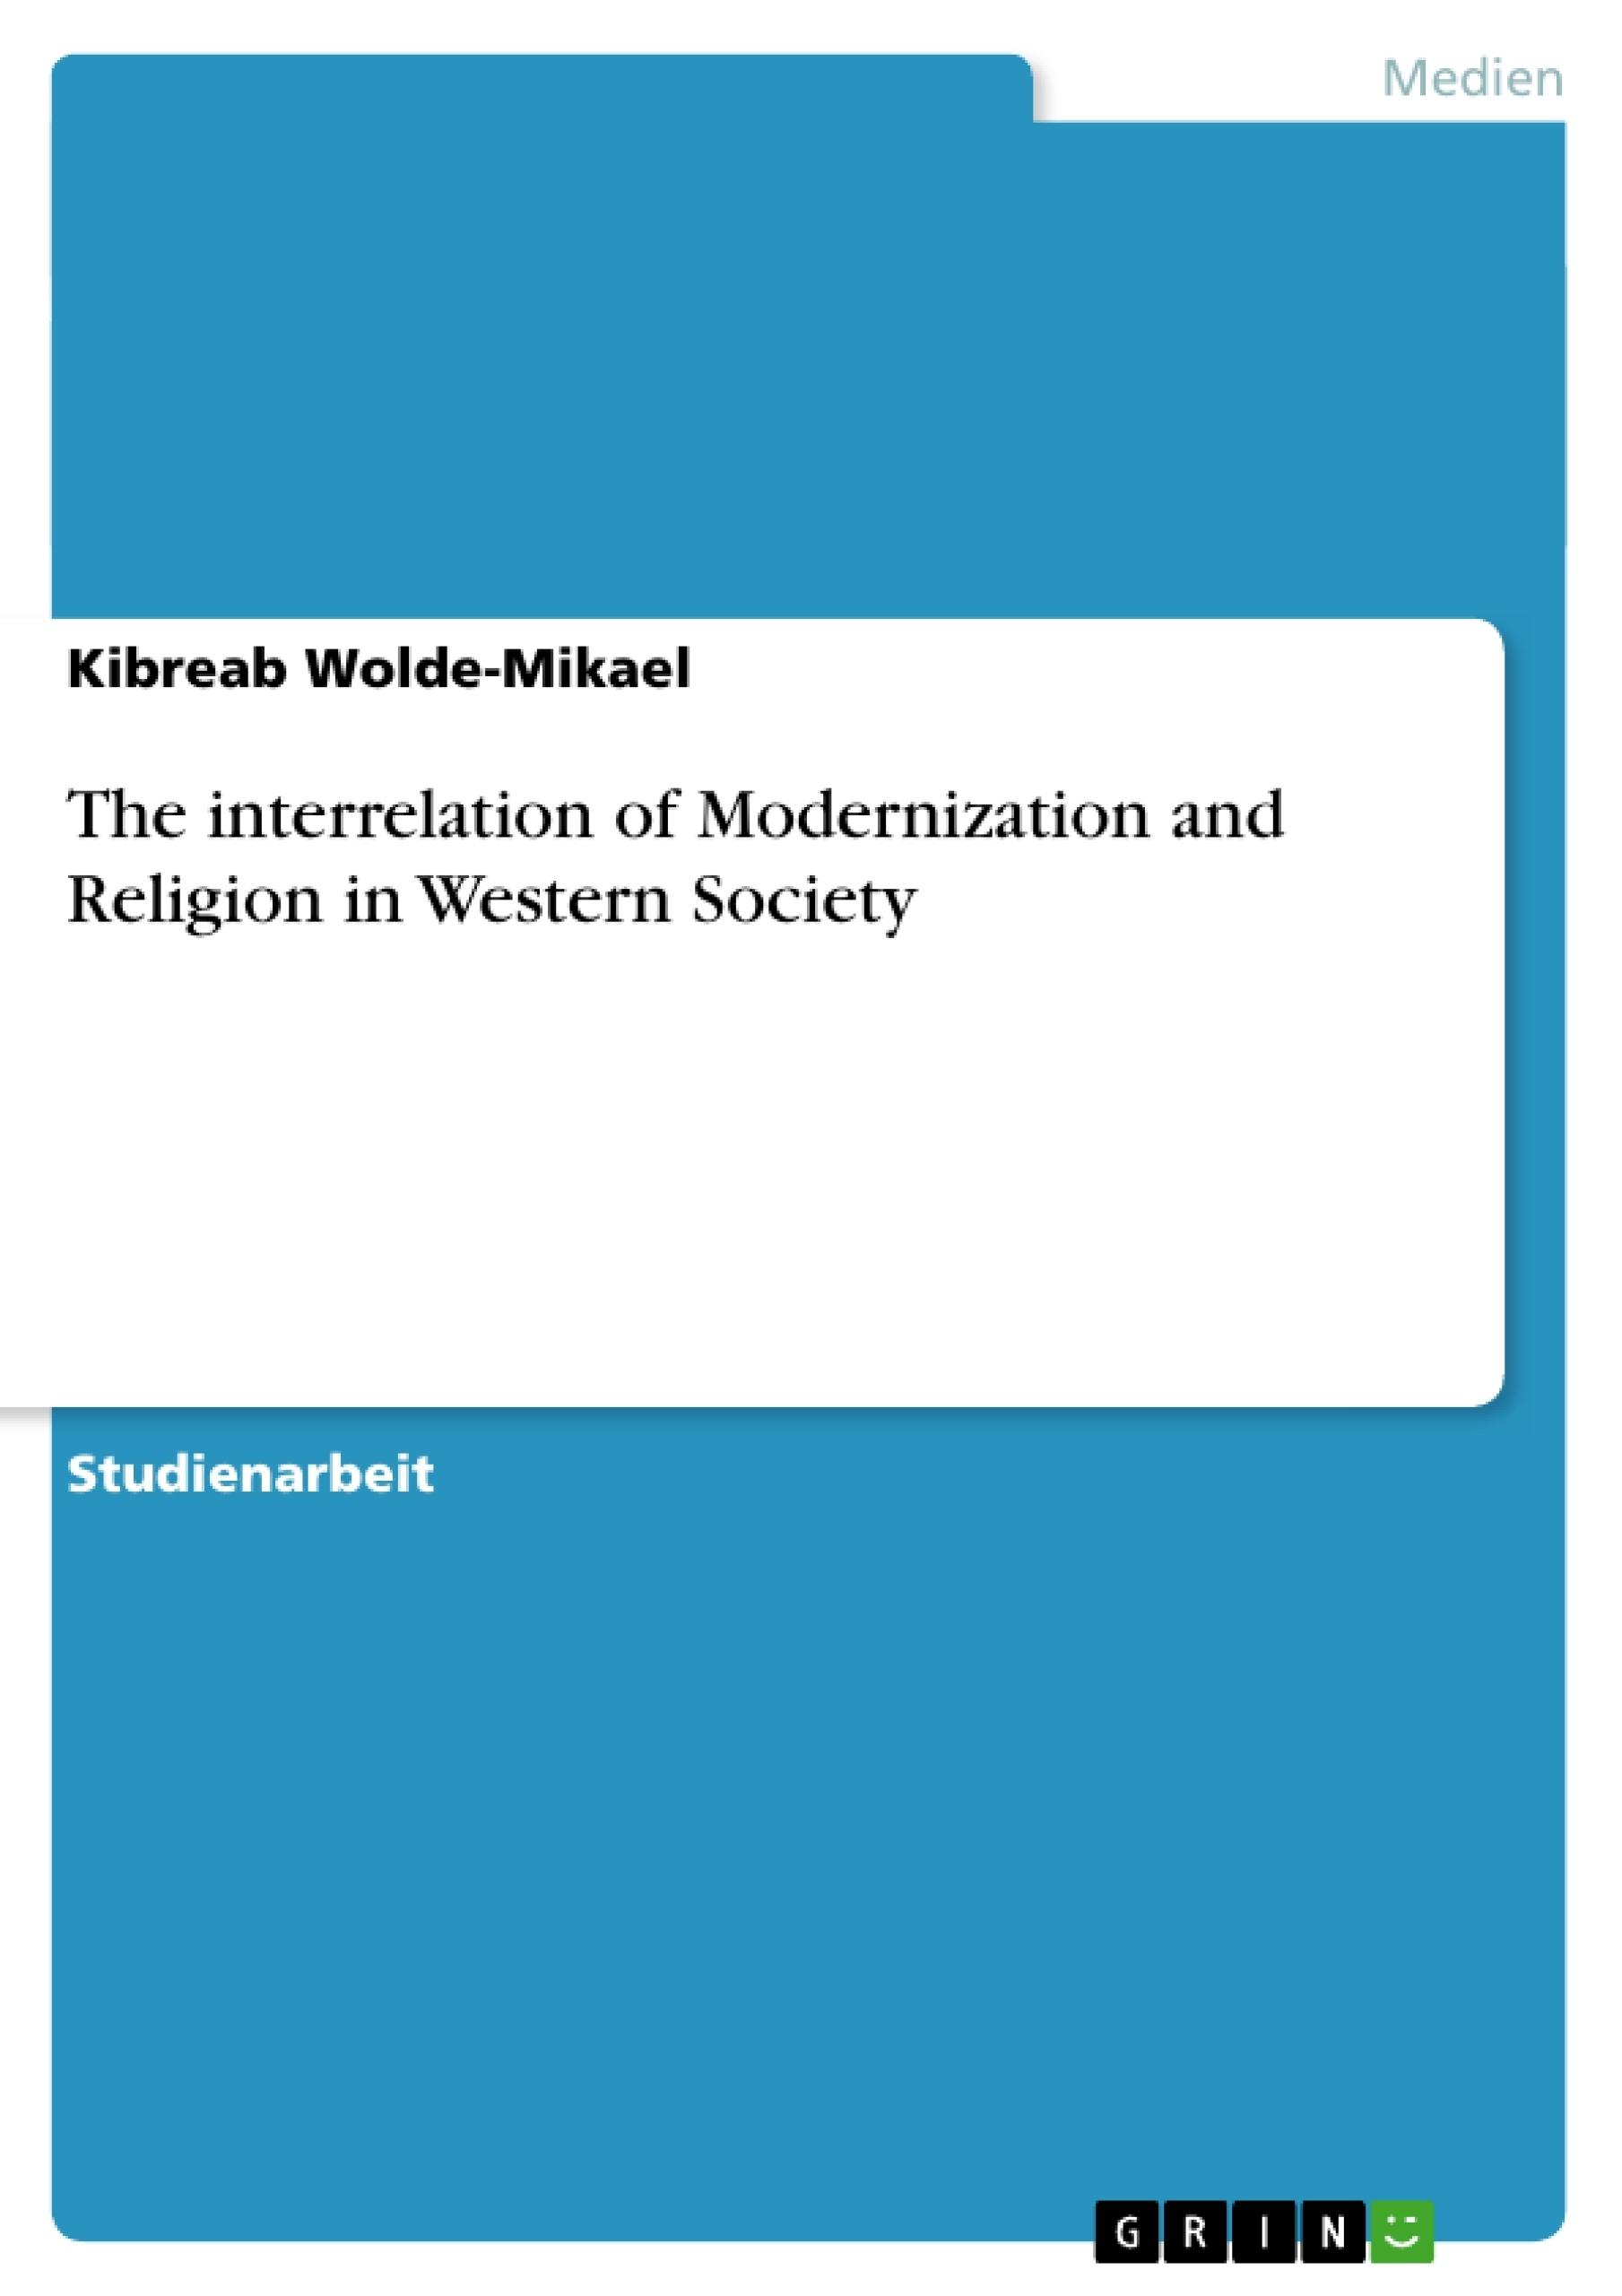 Titel: The interrelation of Modernization and Religion in Western Society